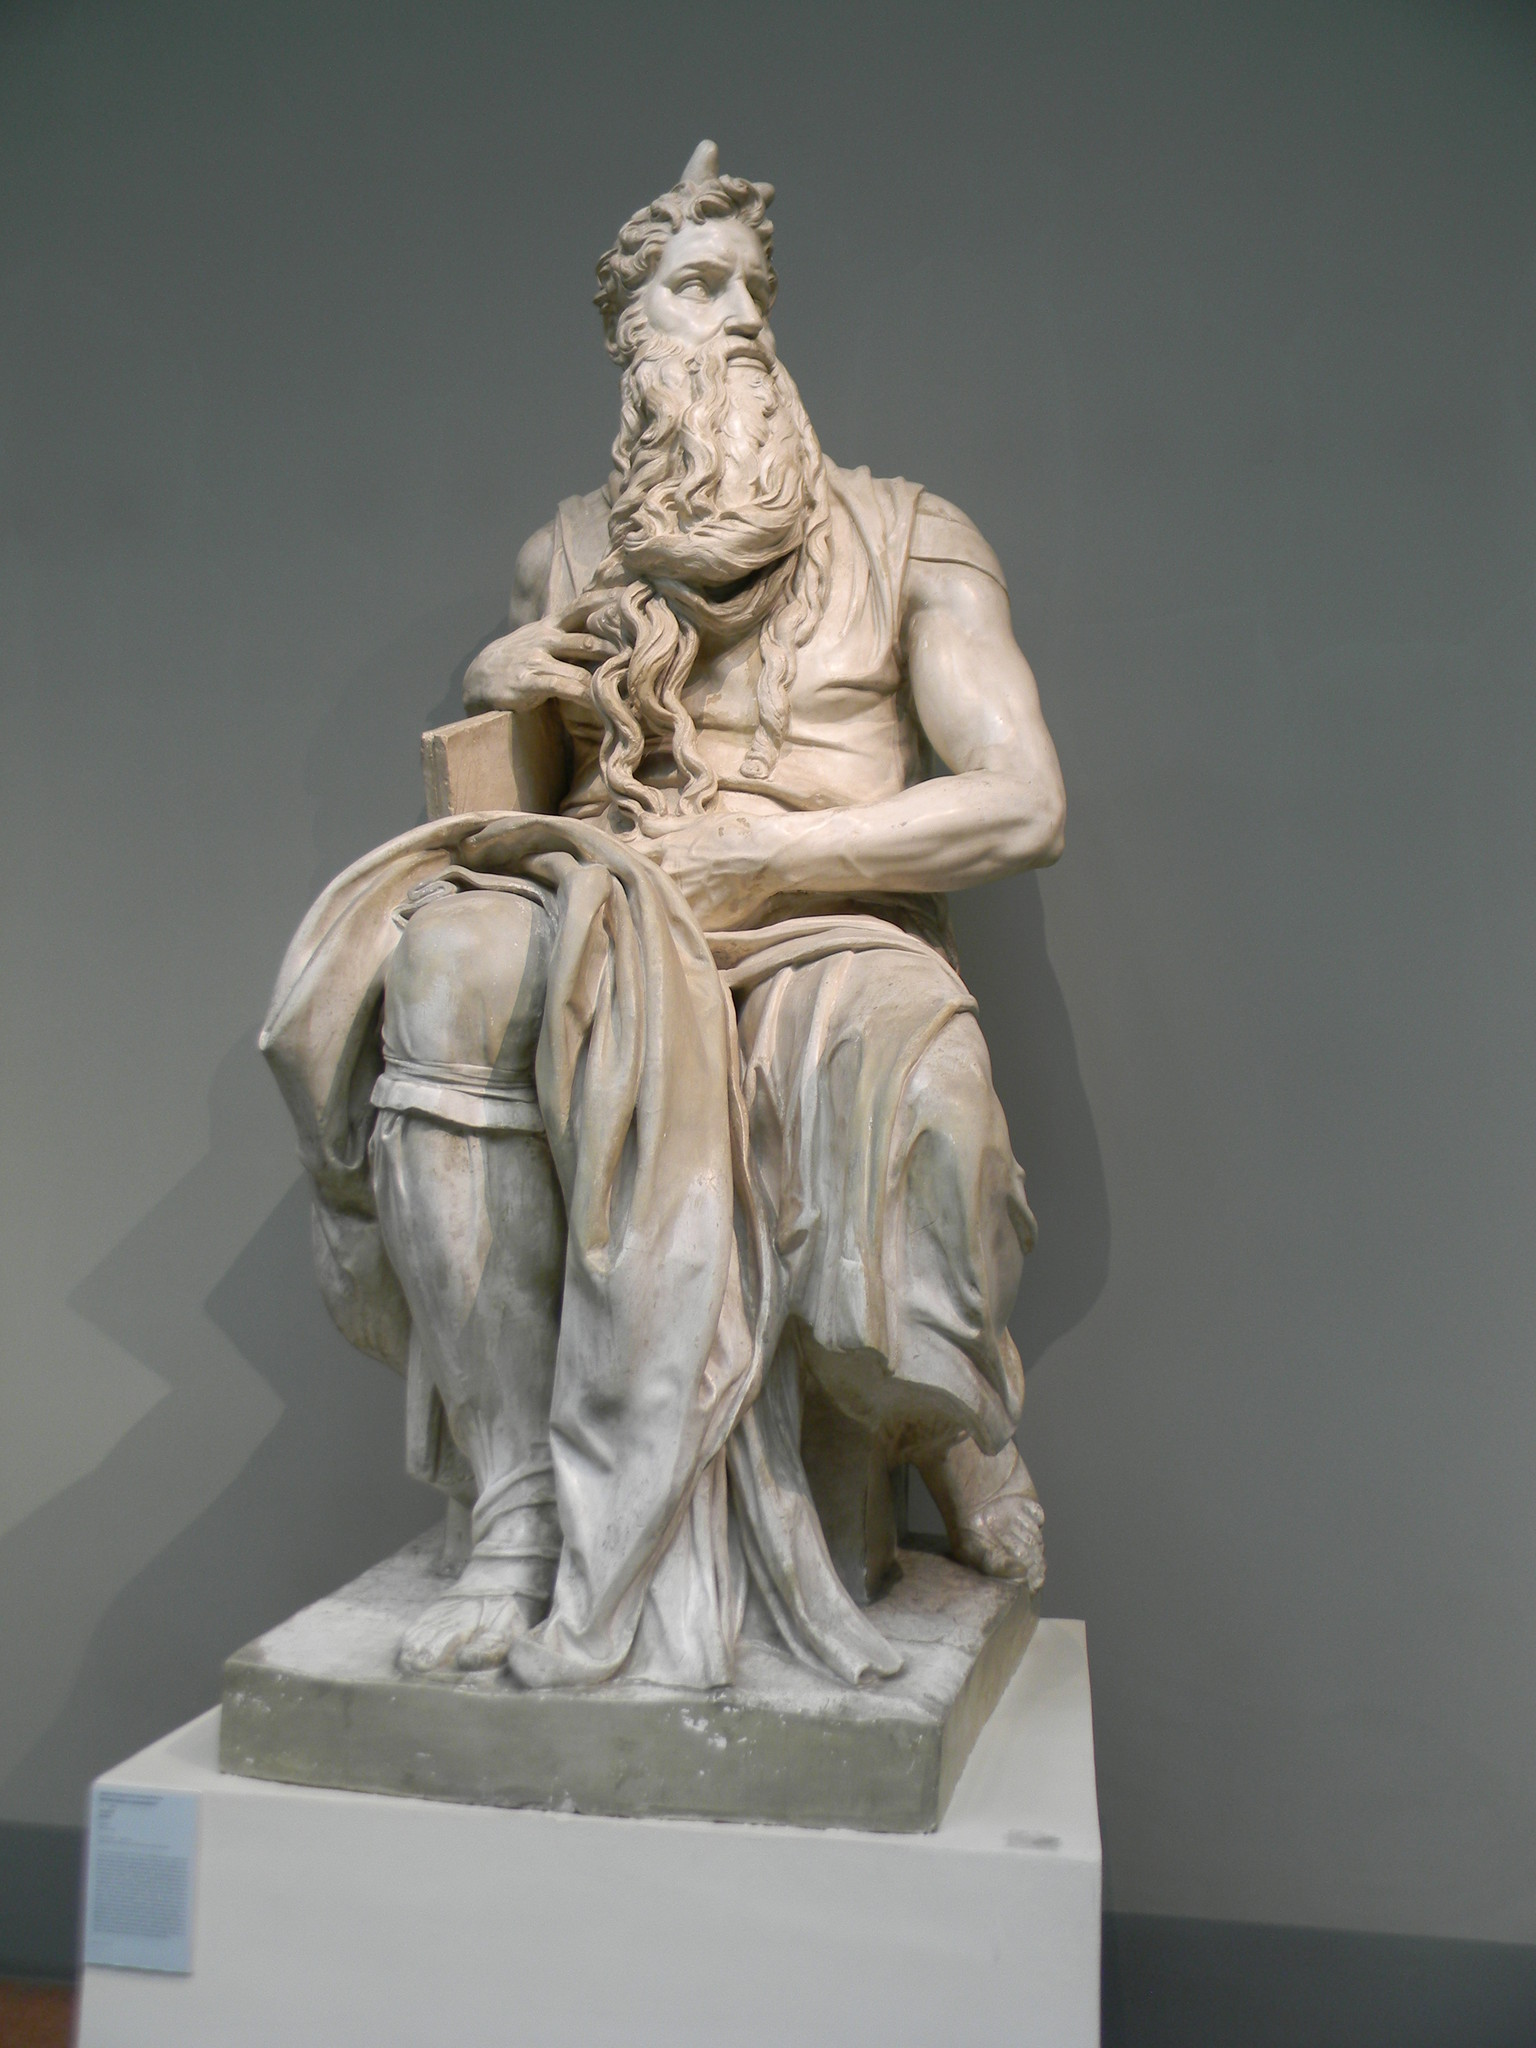 «Моисей». Микеланджело Буонарроти. Слепок. Подлинник - мрамор. Церковь Сан Пьетро ин Винколи, Рим, Италия